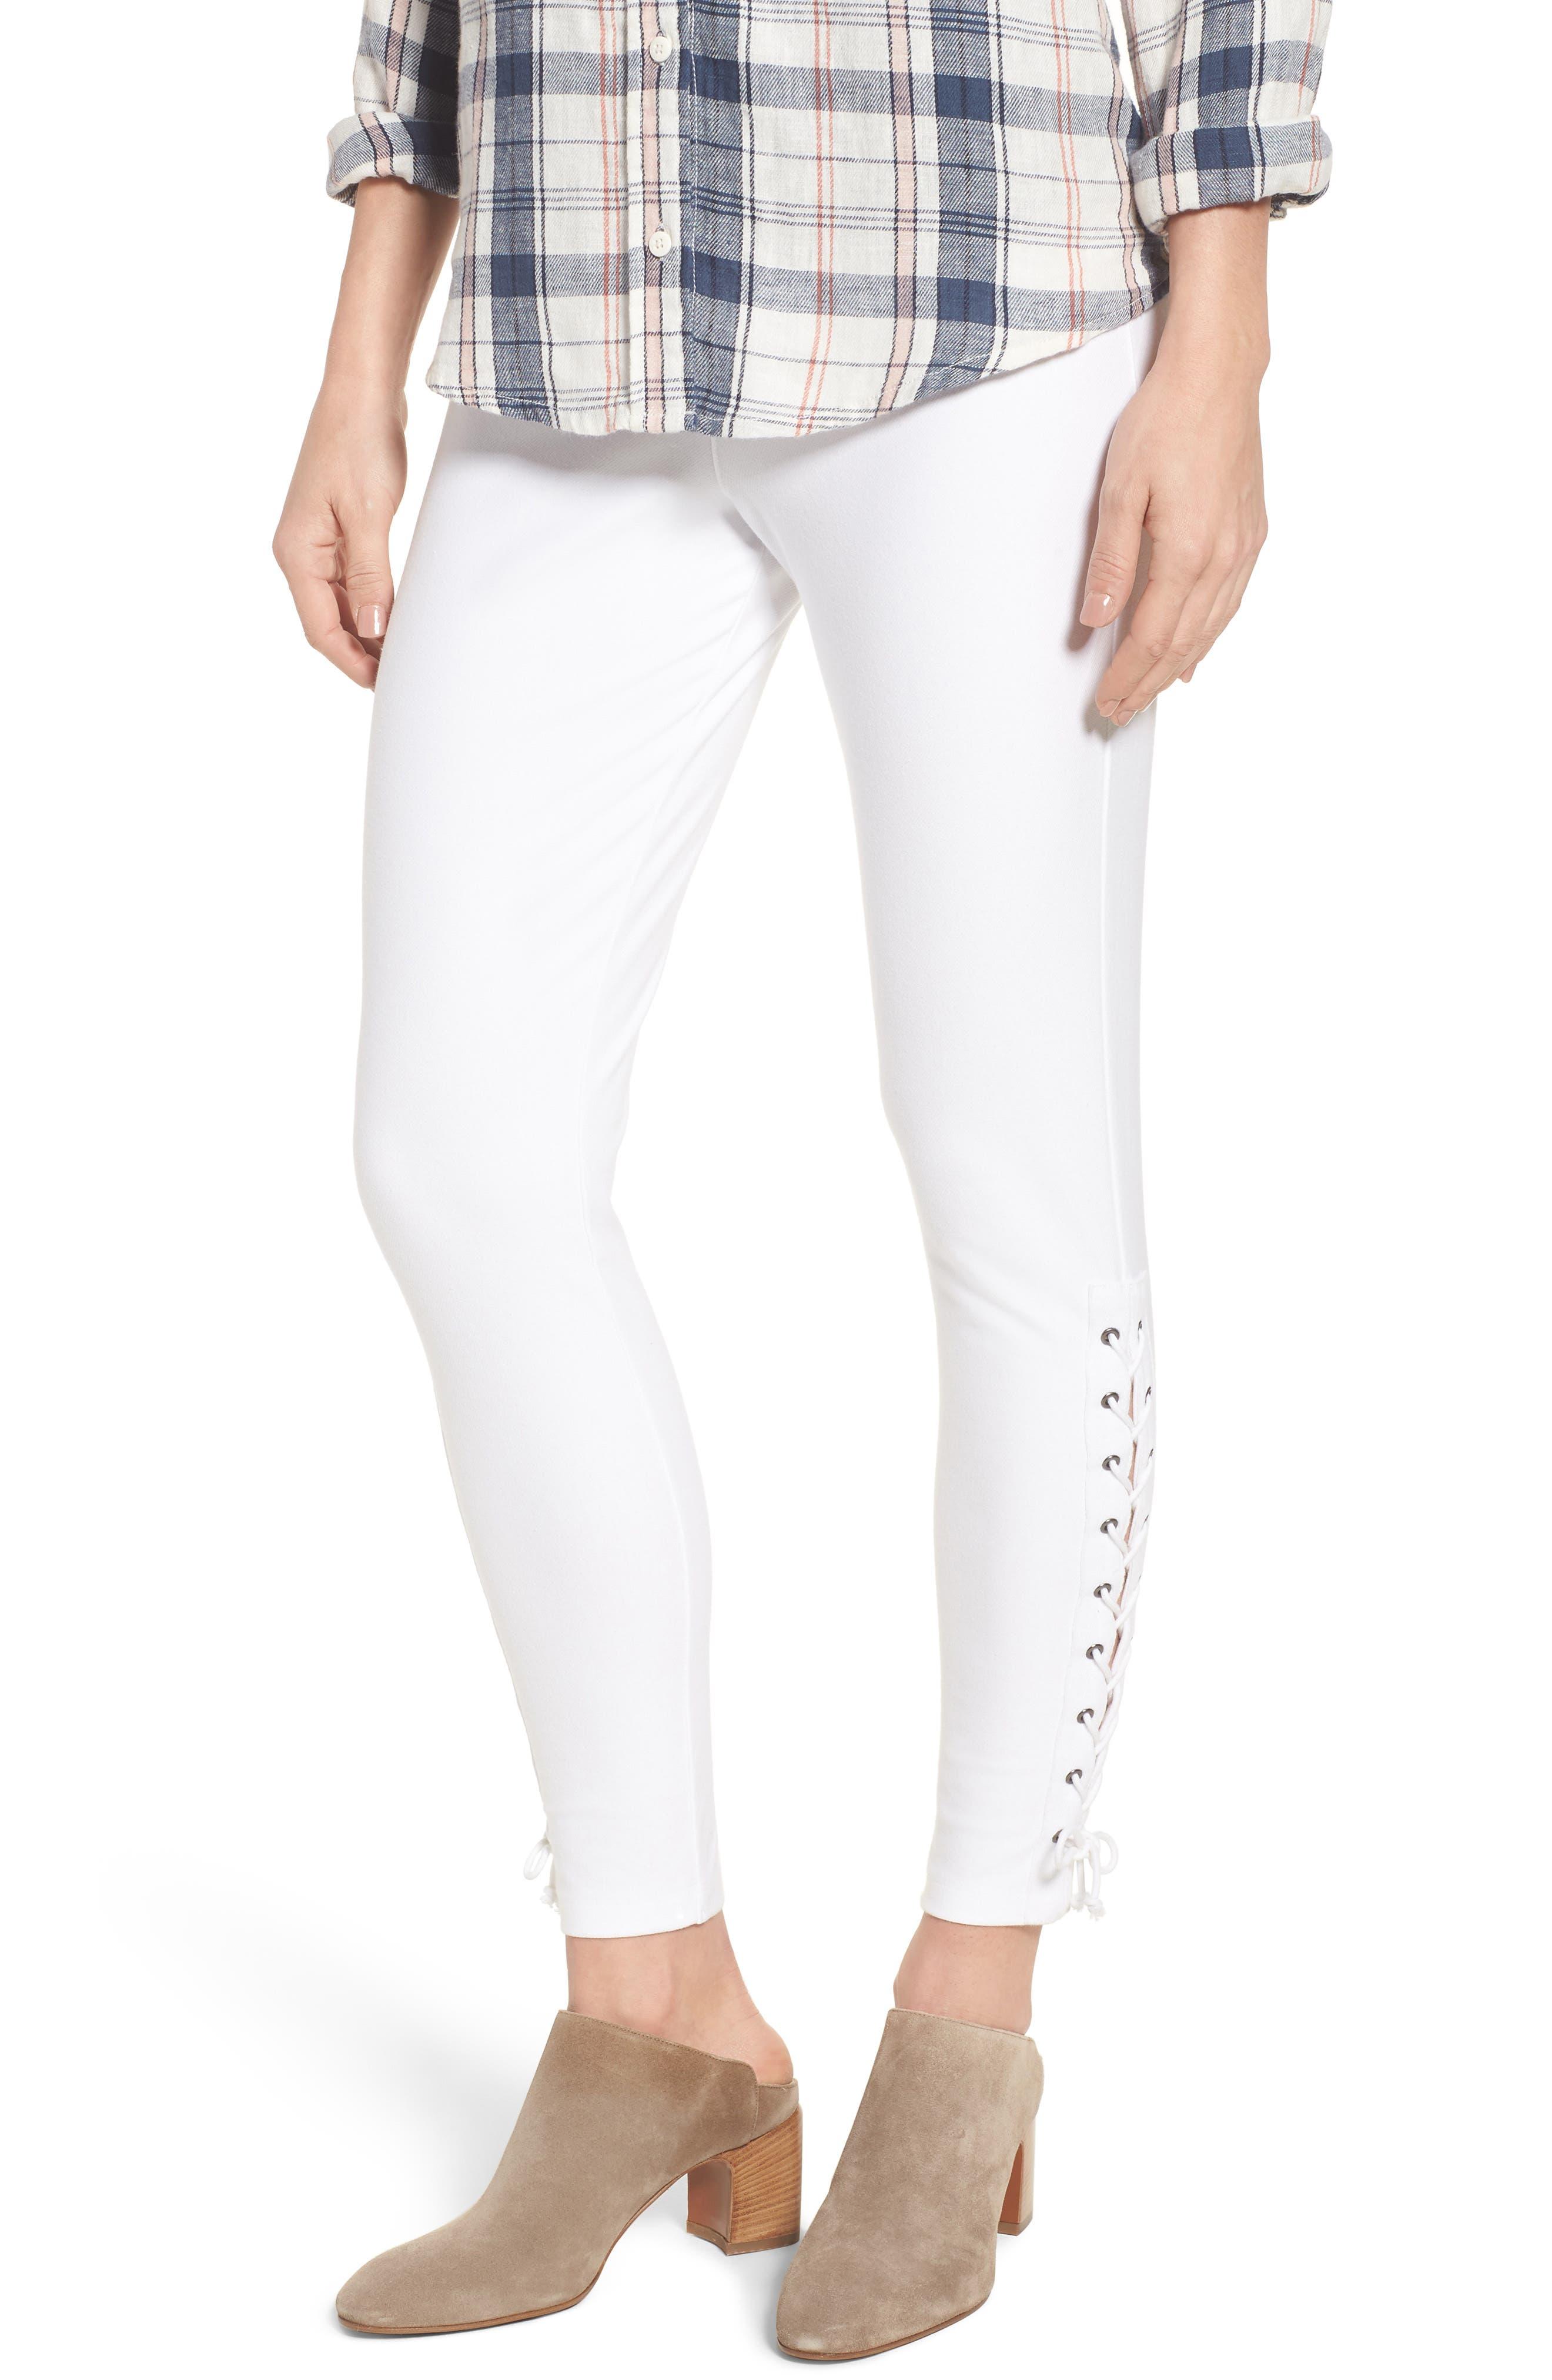 Nordstrom Lace-Up Denim Leggings